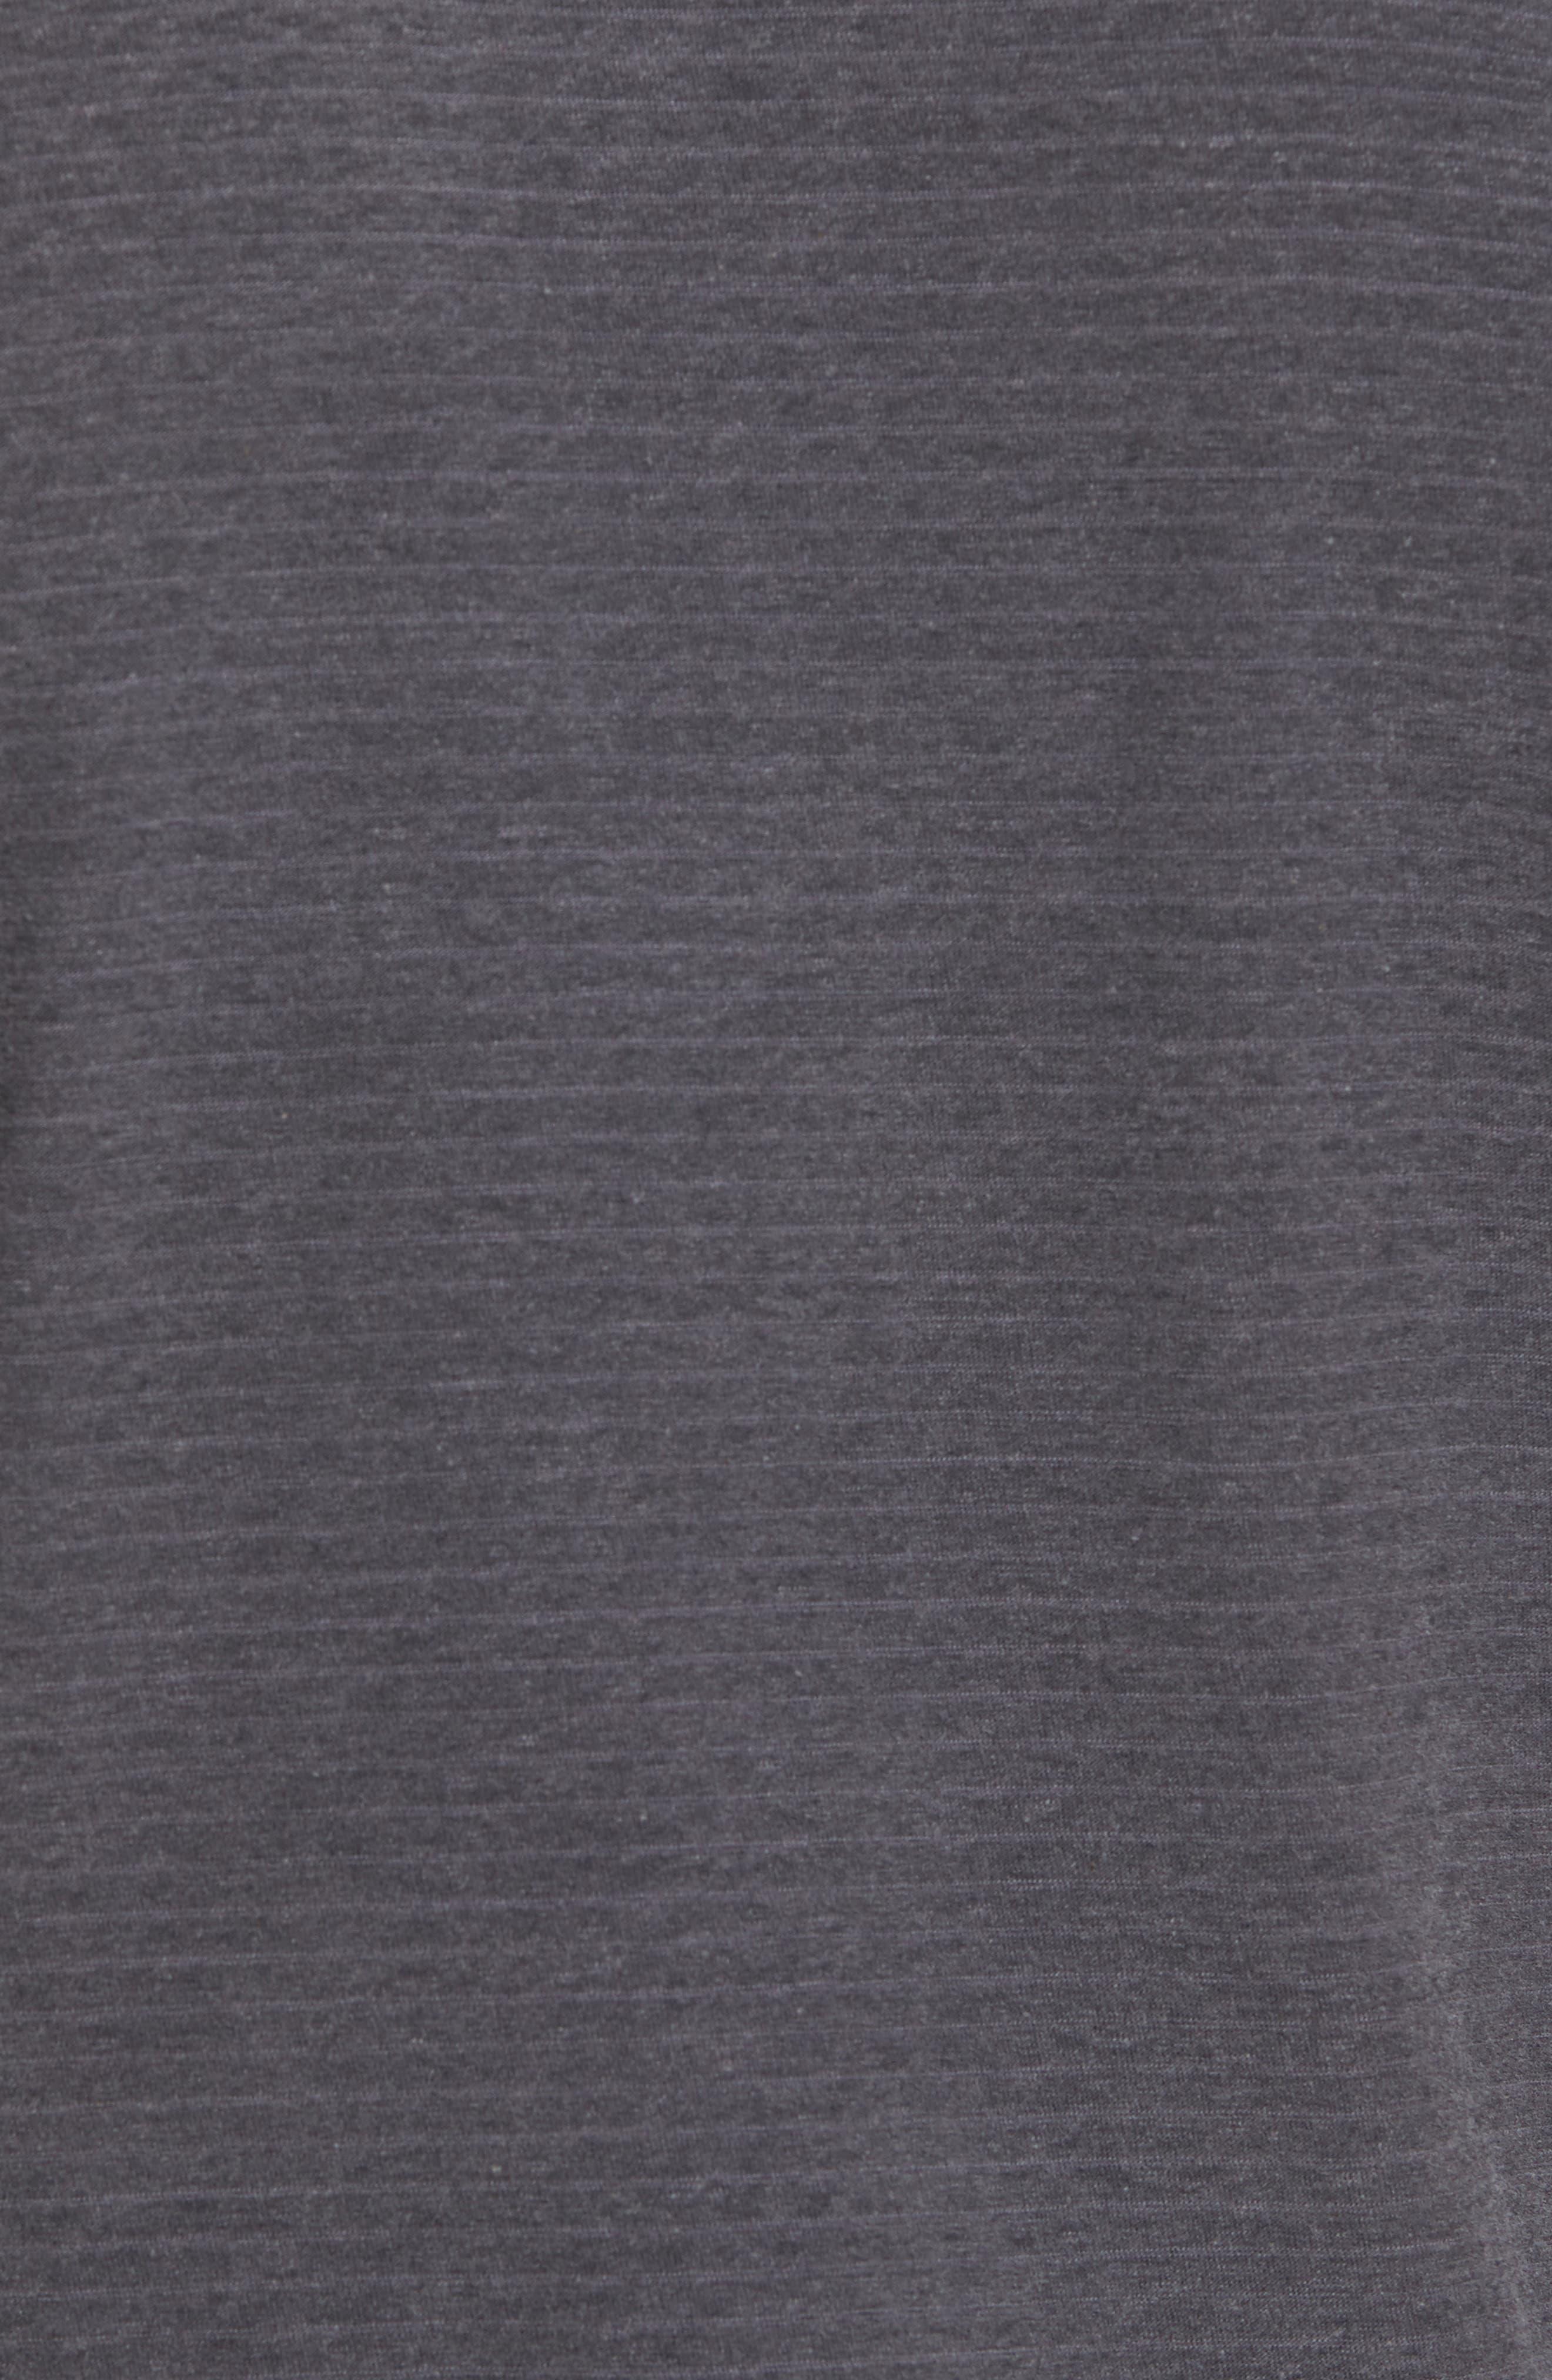 Microstripe Ringer T-Shirt,                             Alternate thumbnail 5, color,                             020